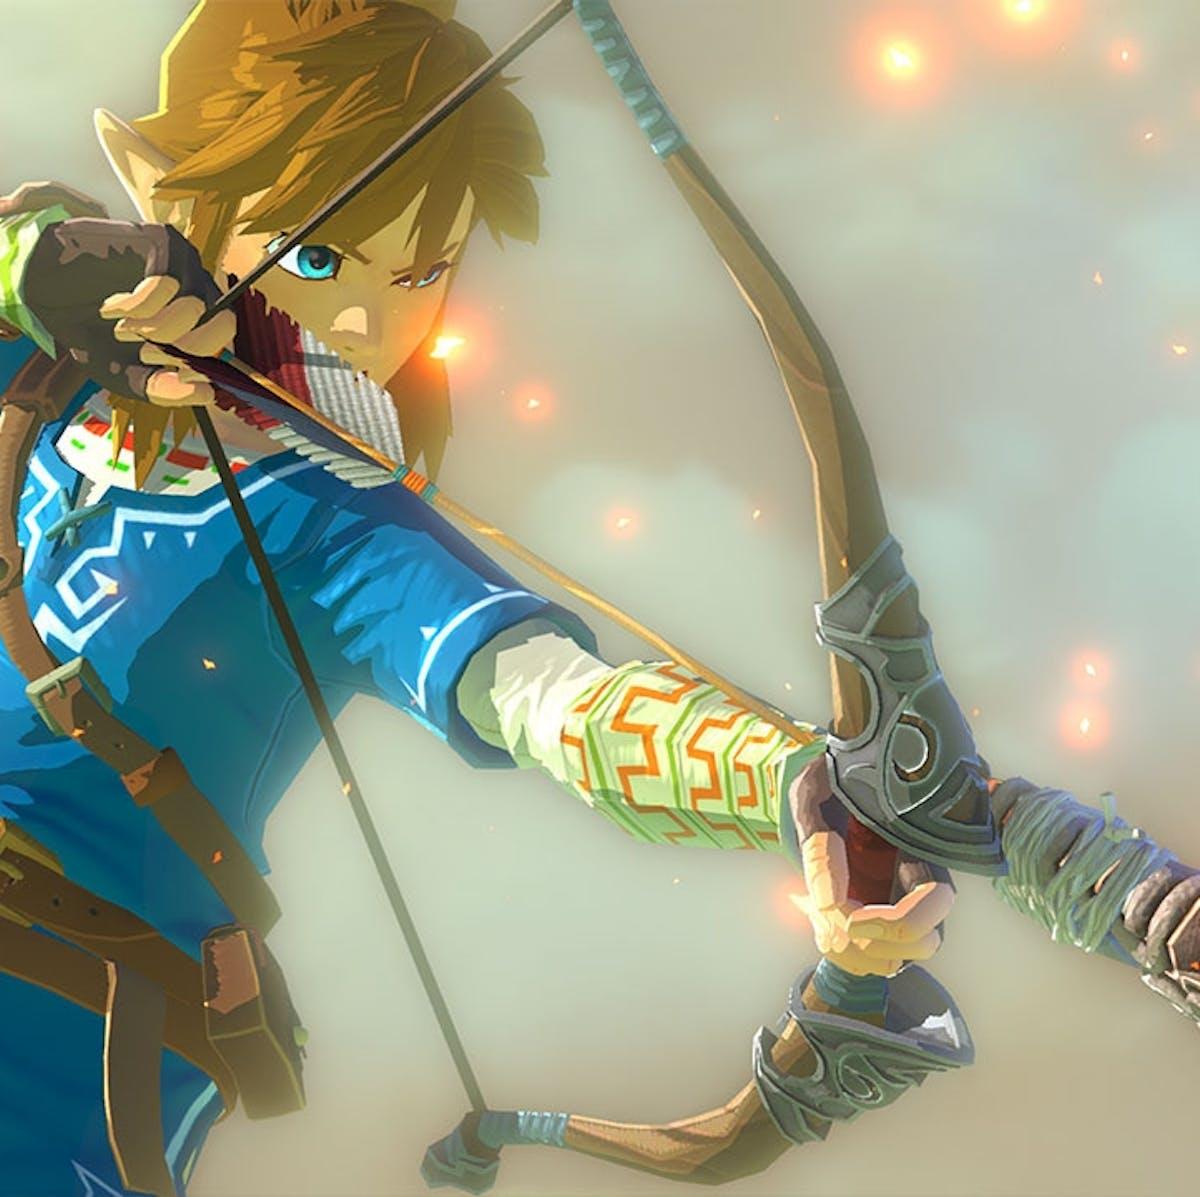 'BotW 2' Map Changes: Nintendo Job Listing Teased Dungeons, New Terrain